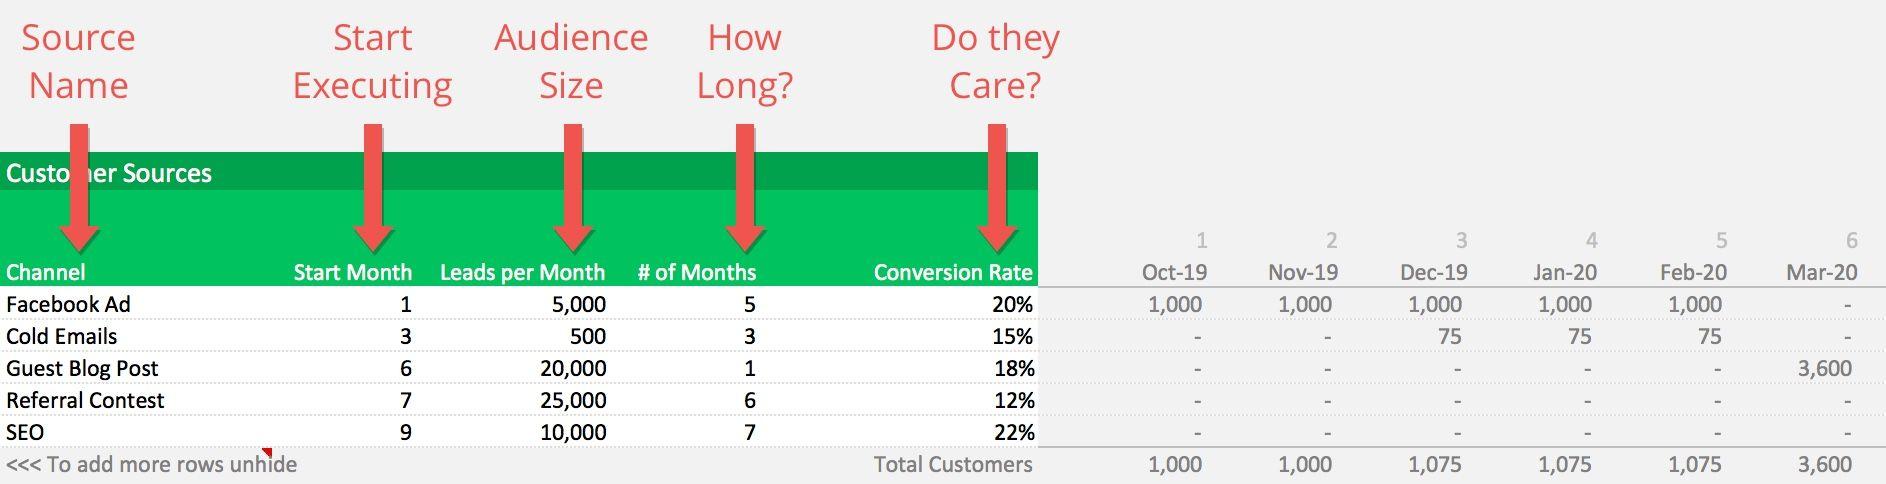 customer conversion example